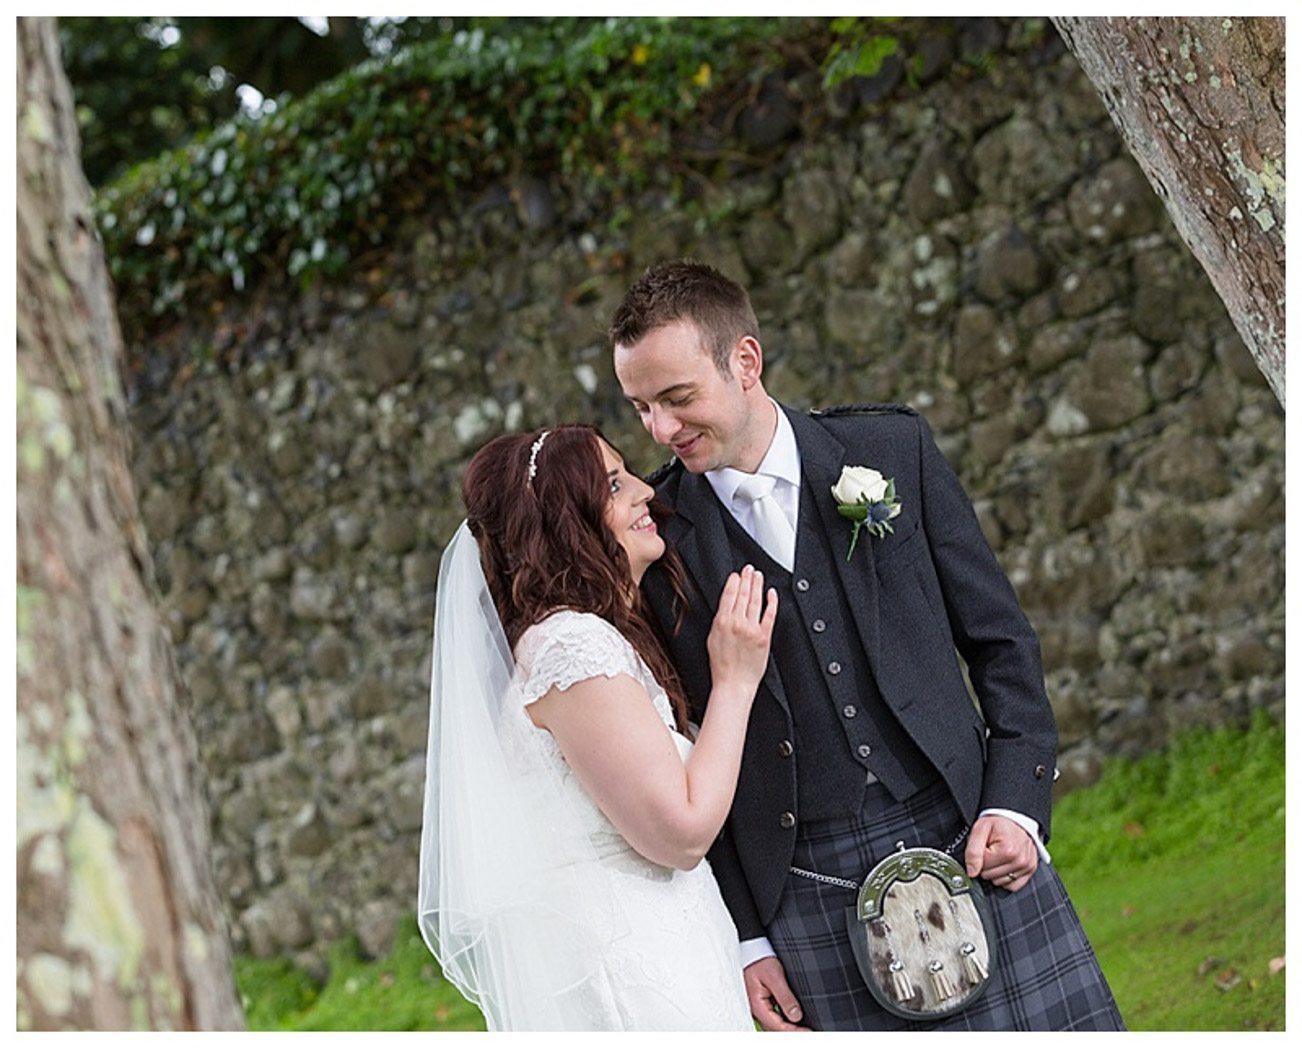 Ballygally Castle Wedding Photographs by Ricky Parker Photography-45